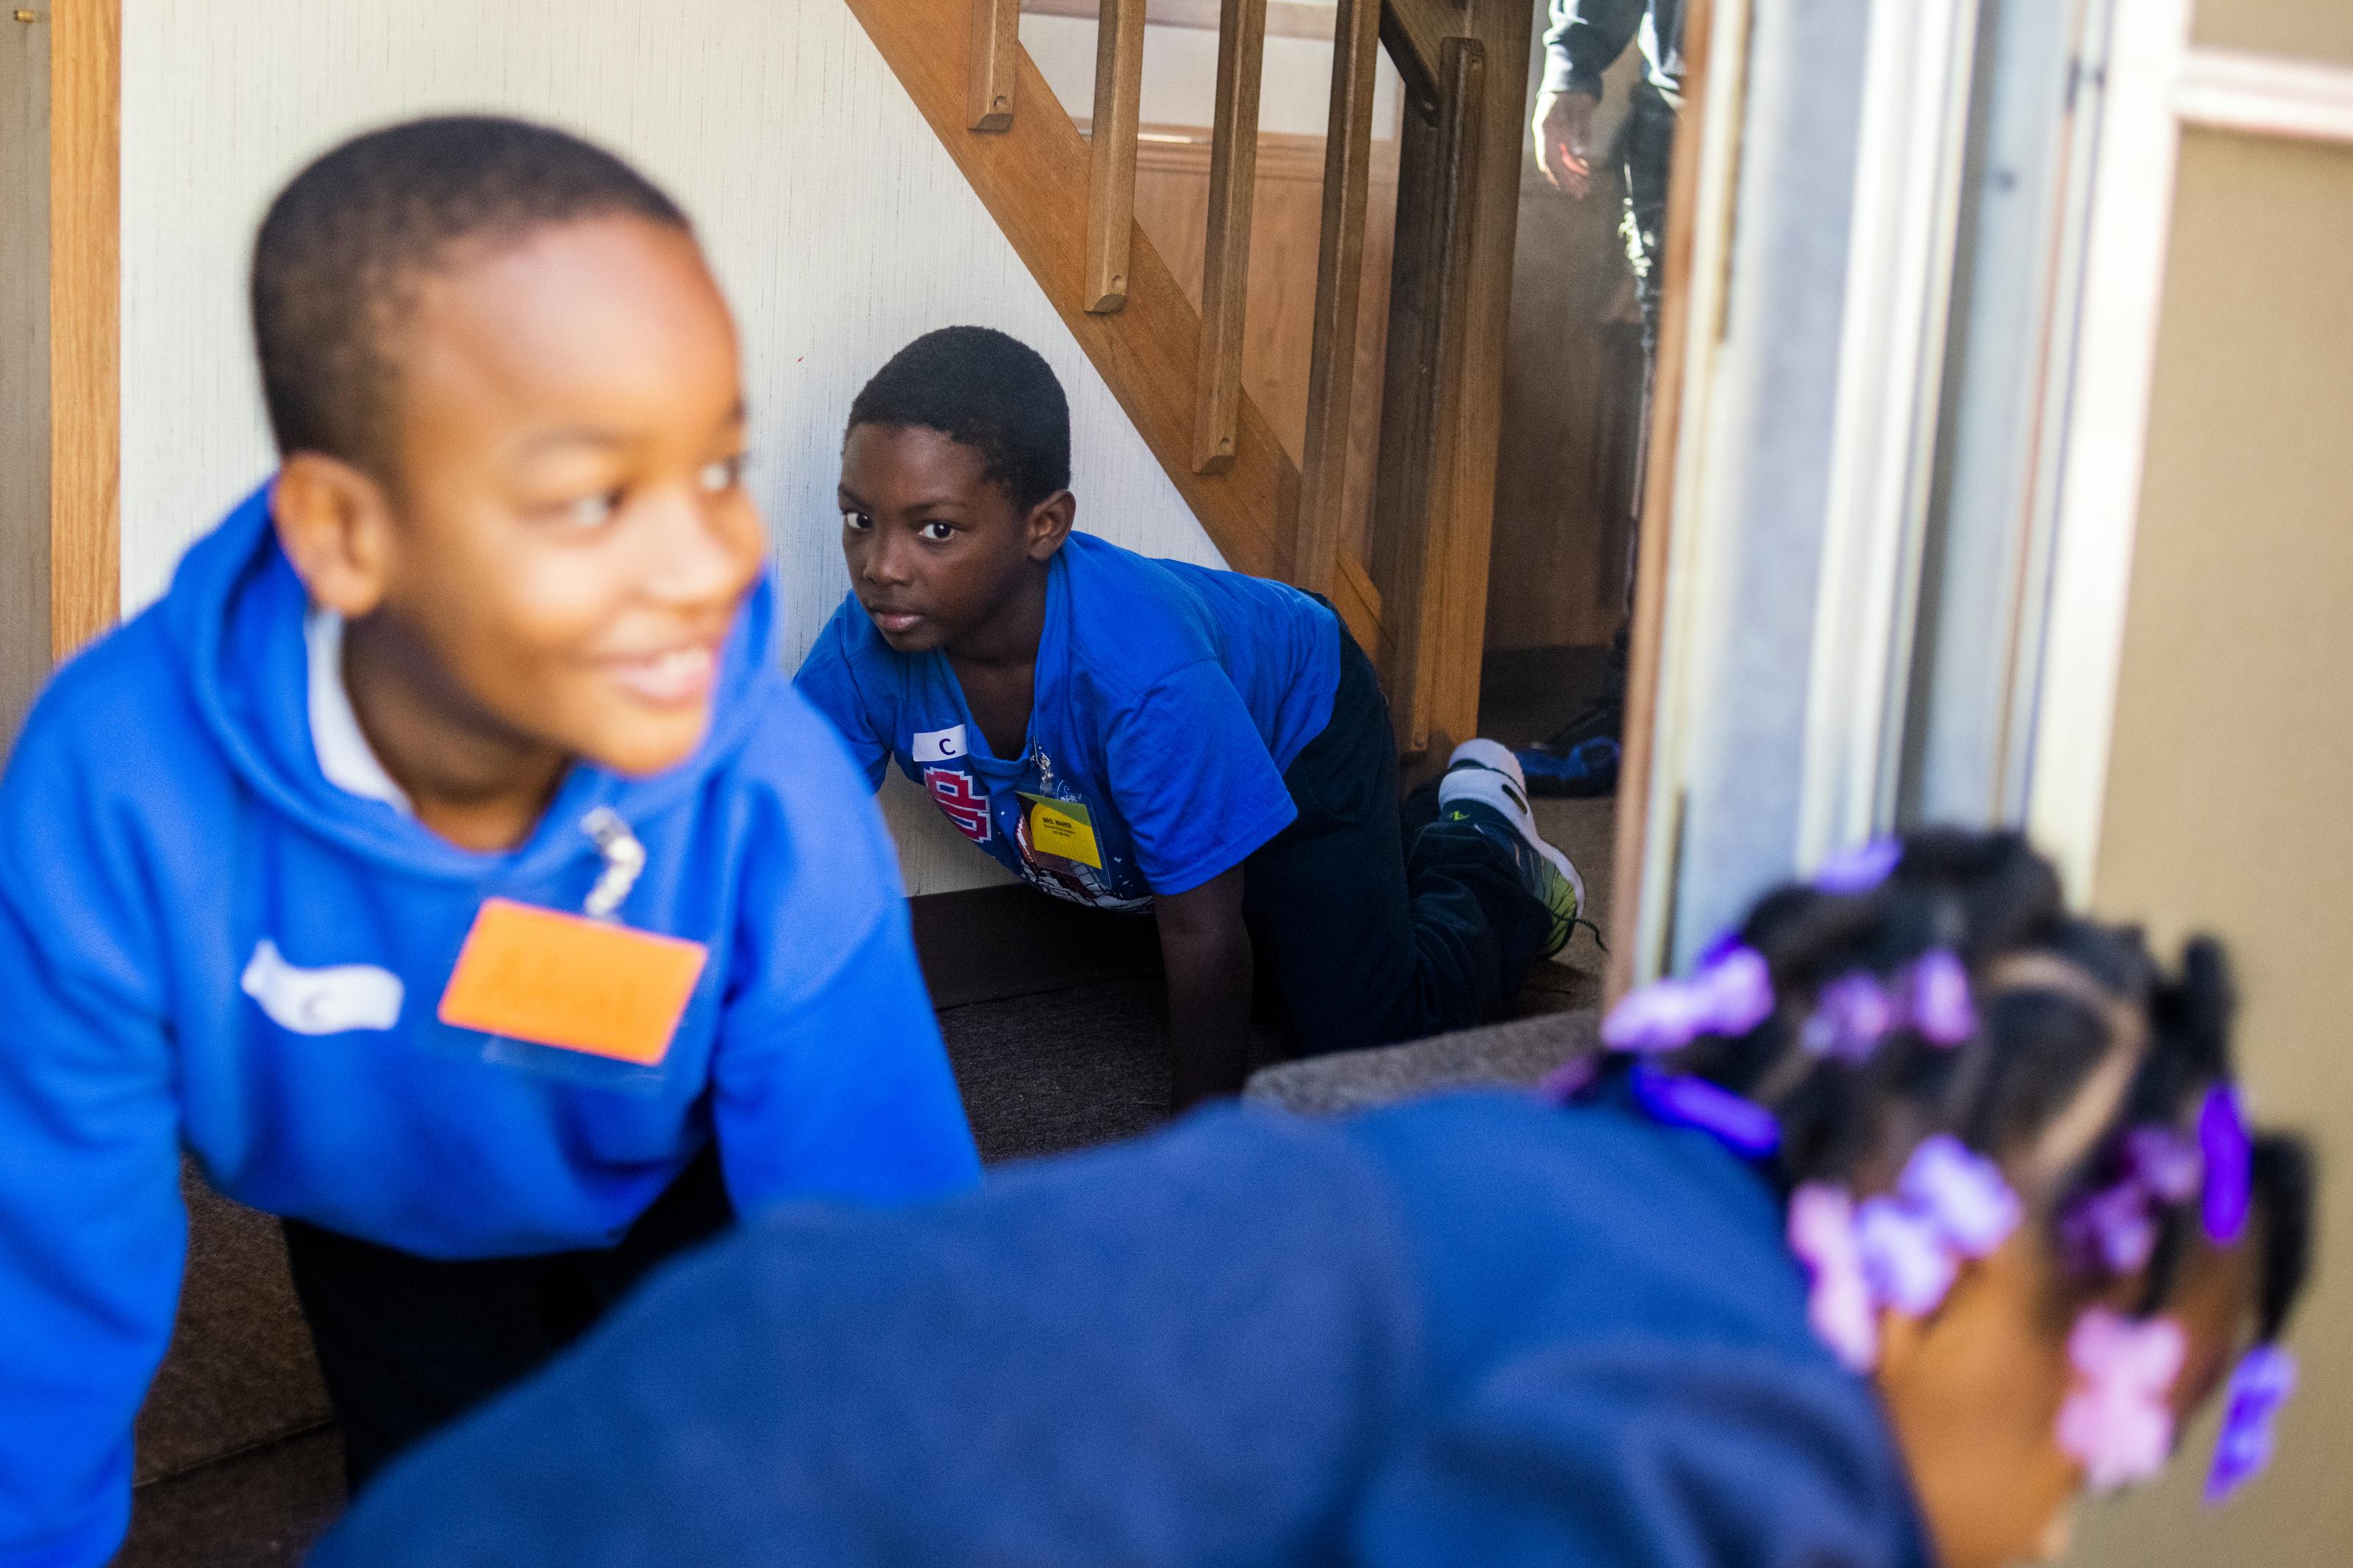 Flint firefighters train first-graders in fire prevention